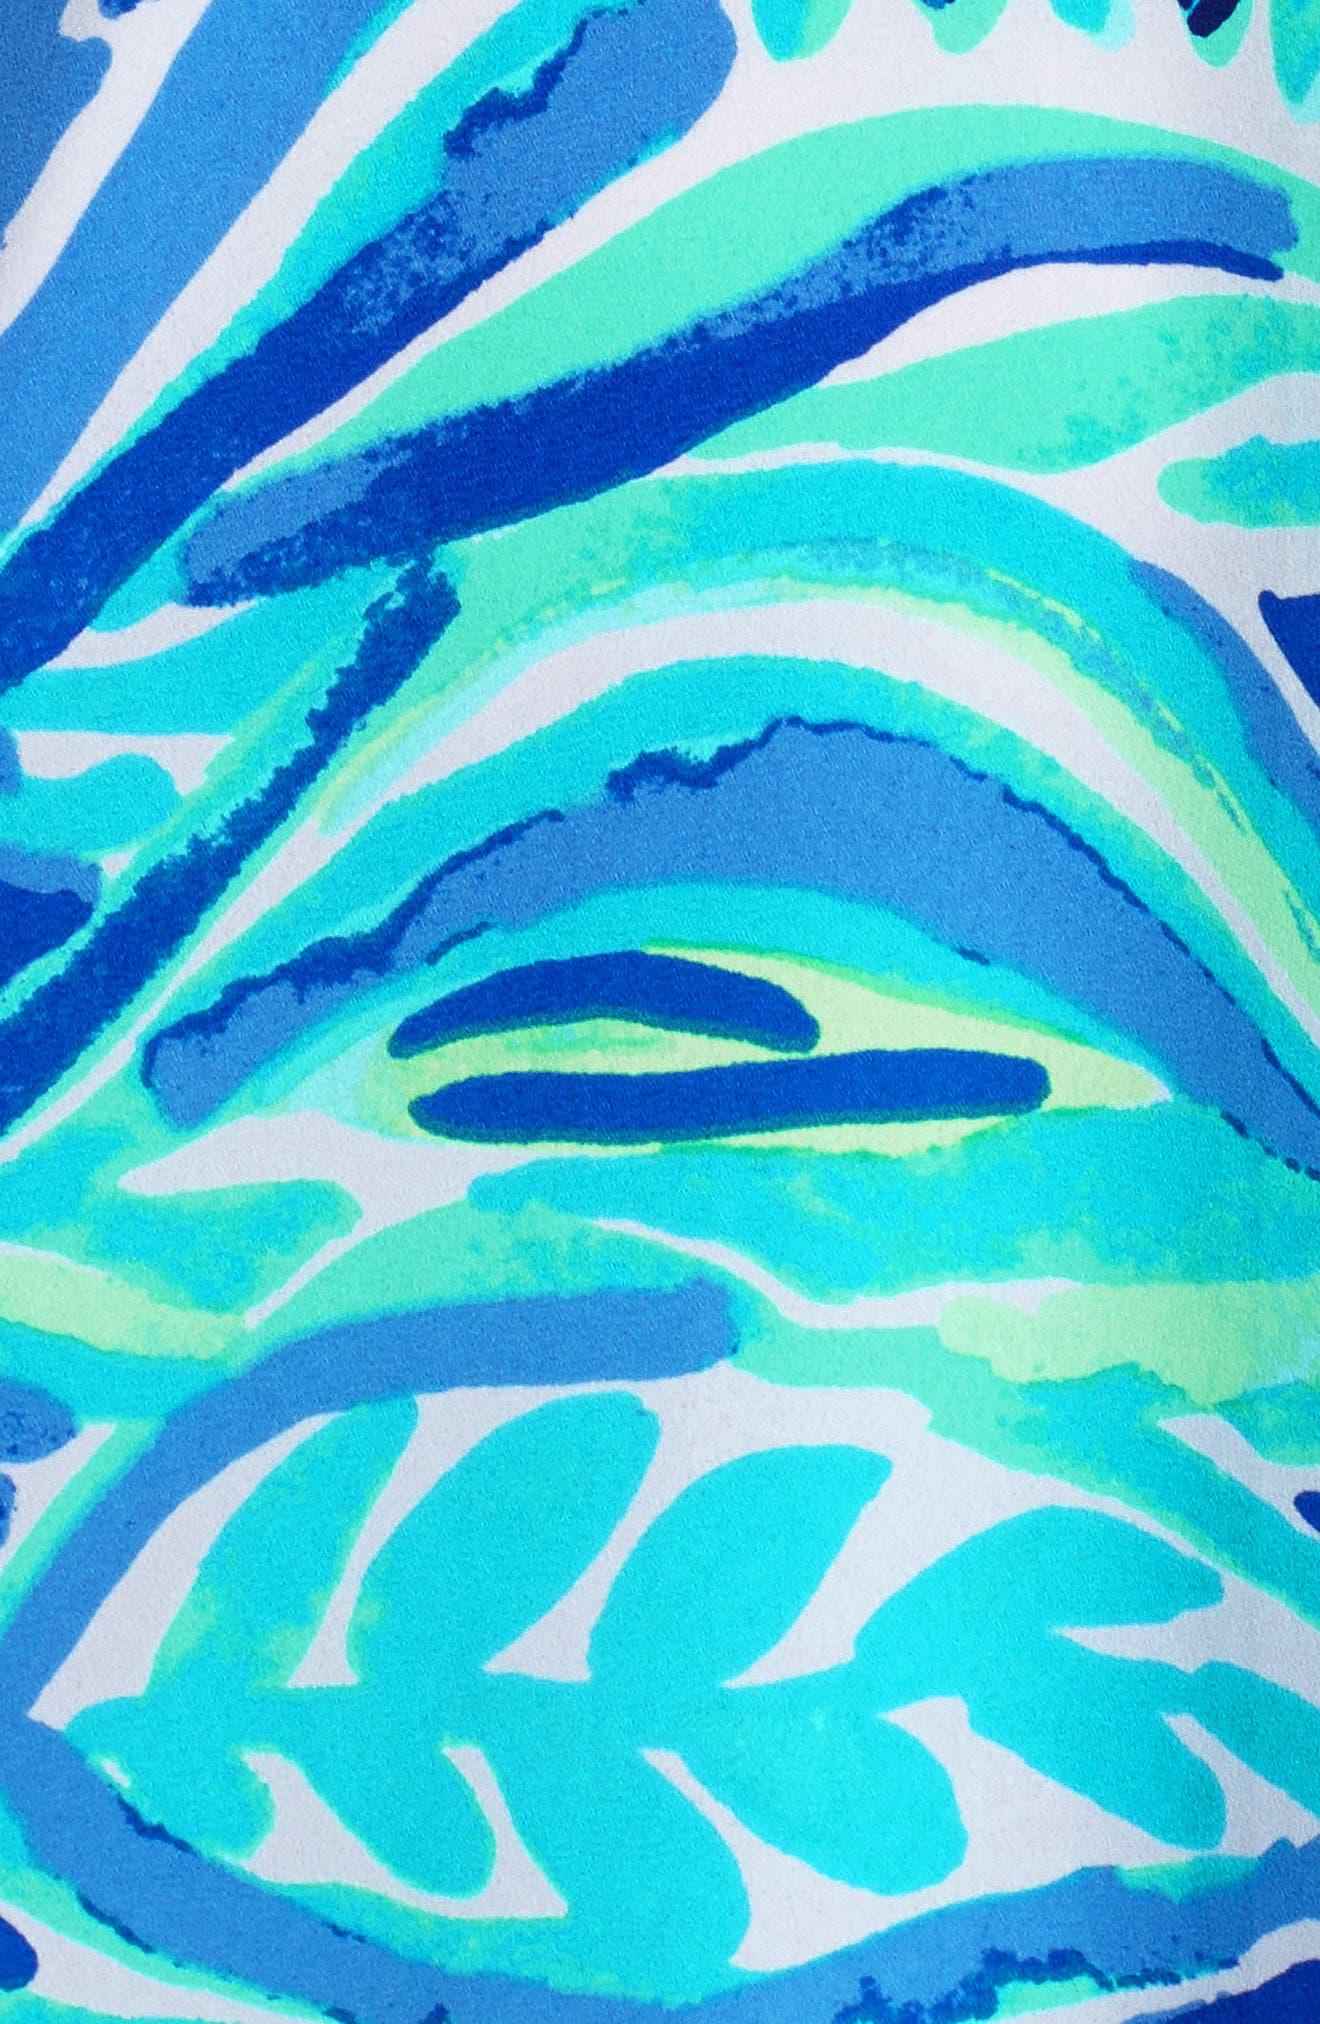 Rosalia Bell Sleeve Shift Dress,                             Alternate thumbnail 5, color,                             Beckon Blue Palm Passage